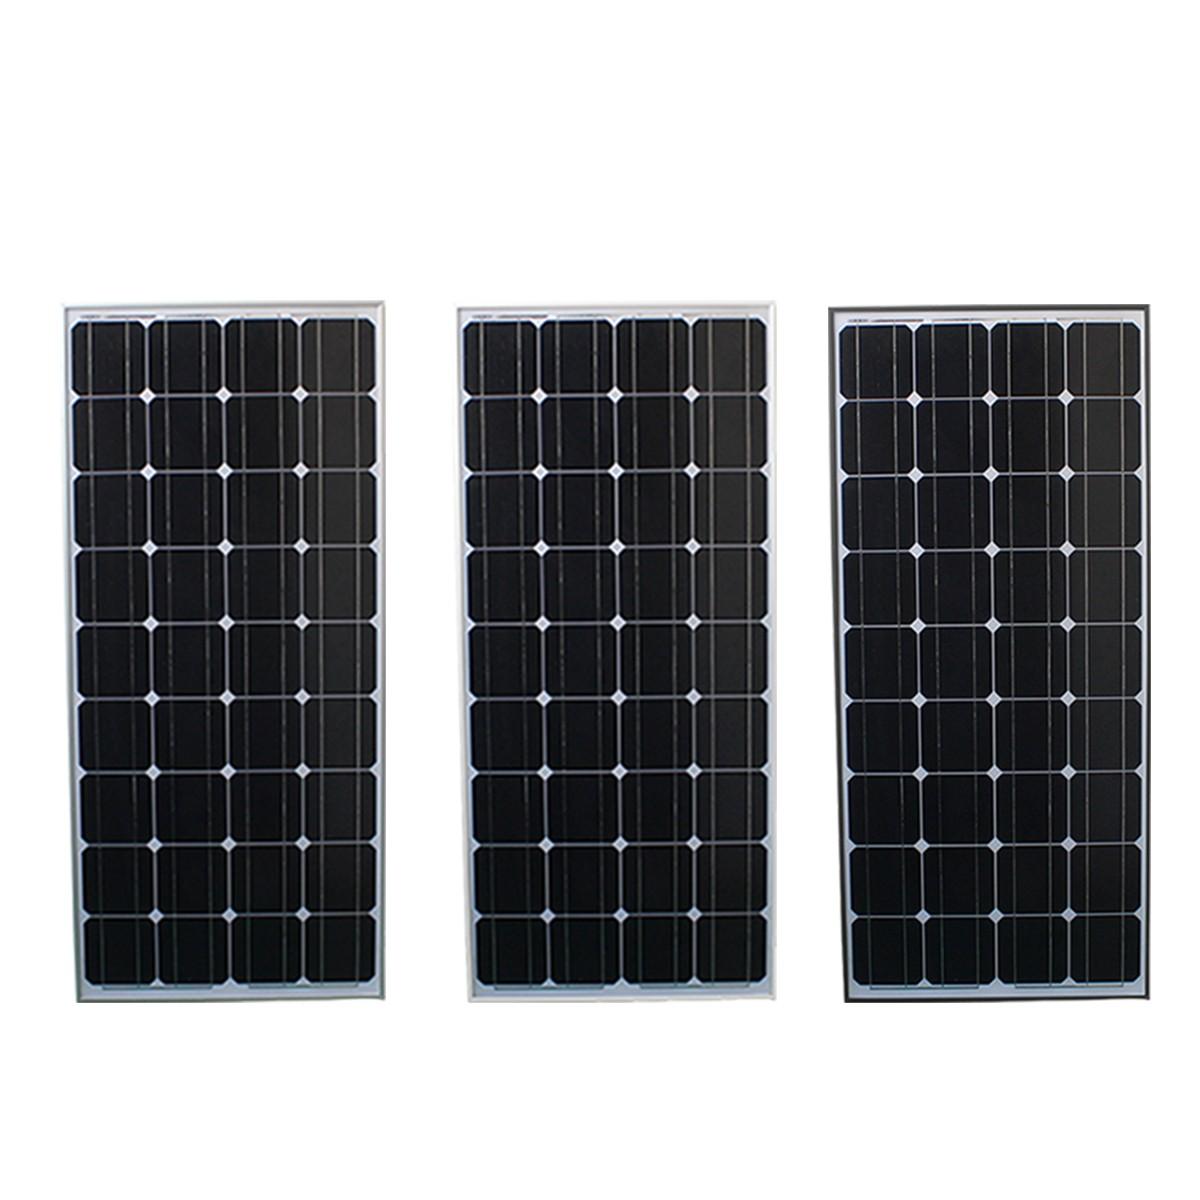 Elfeland Sm 100m 1200x540x30mm 100w Solar Panel For 12v